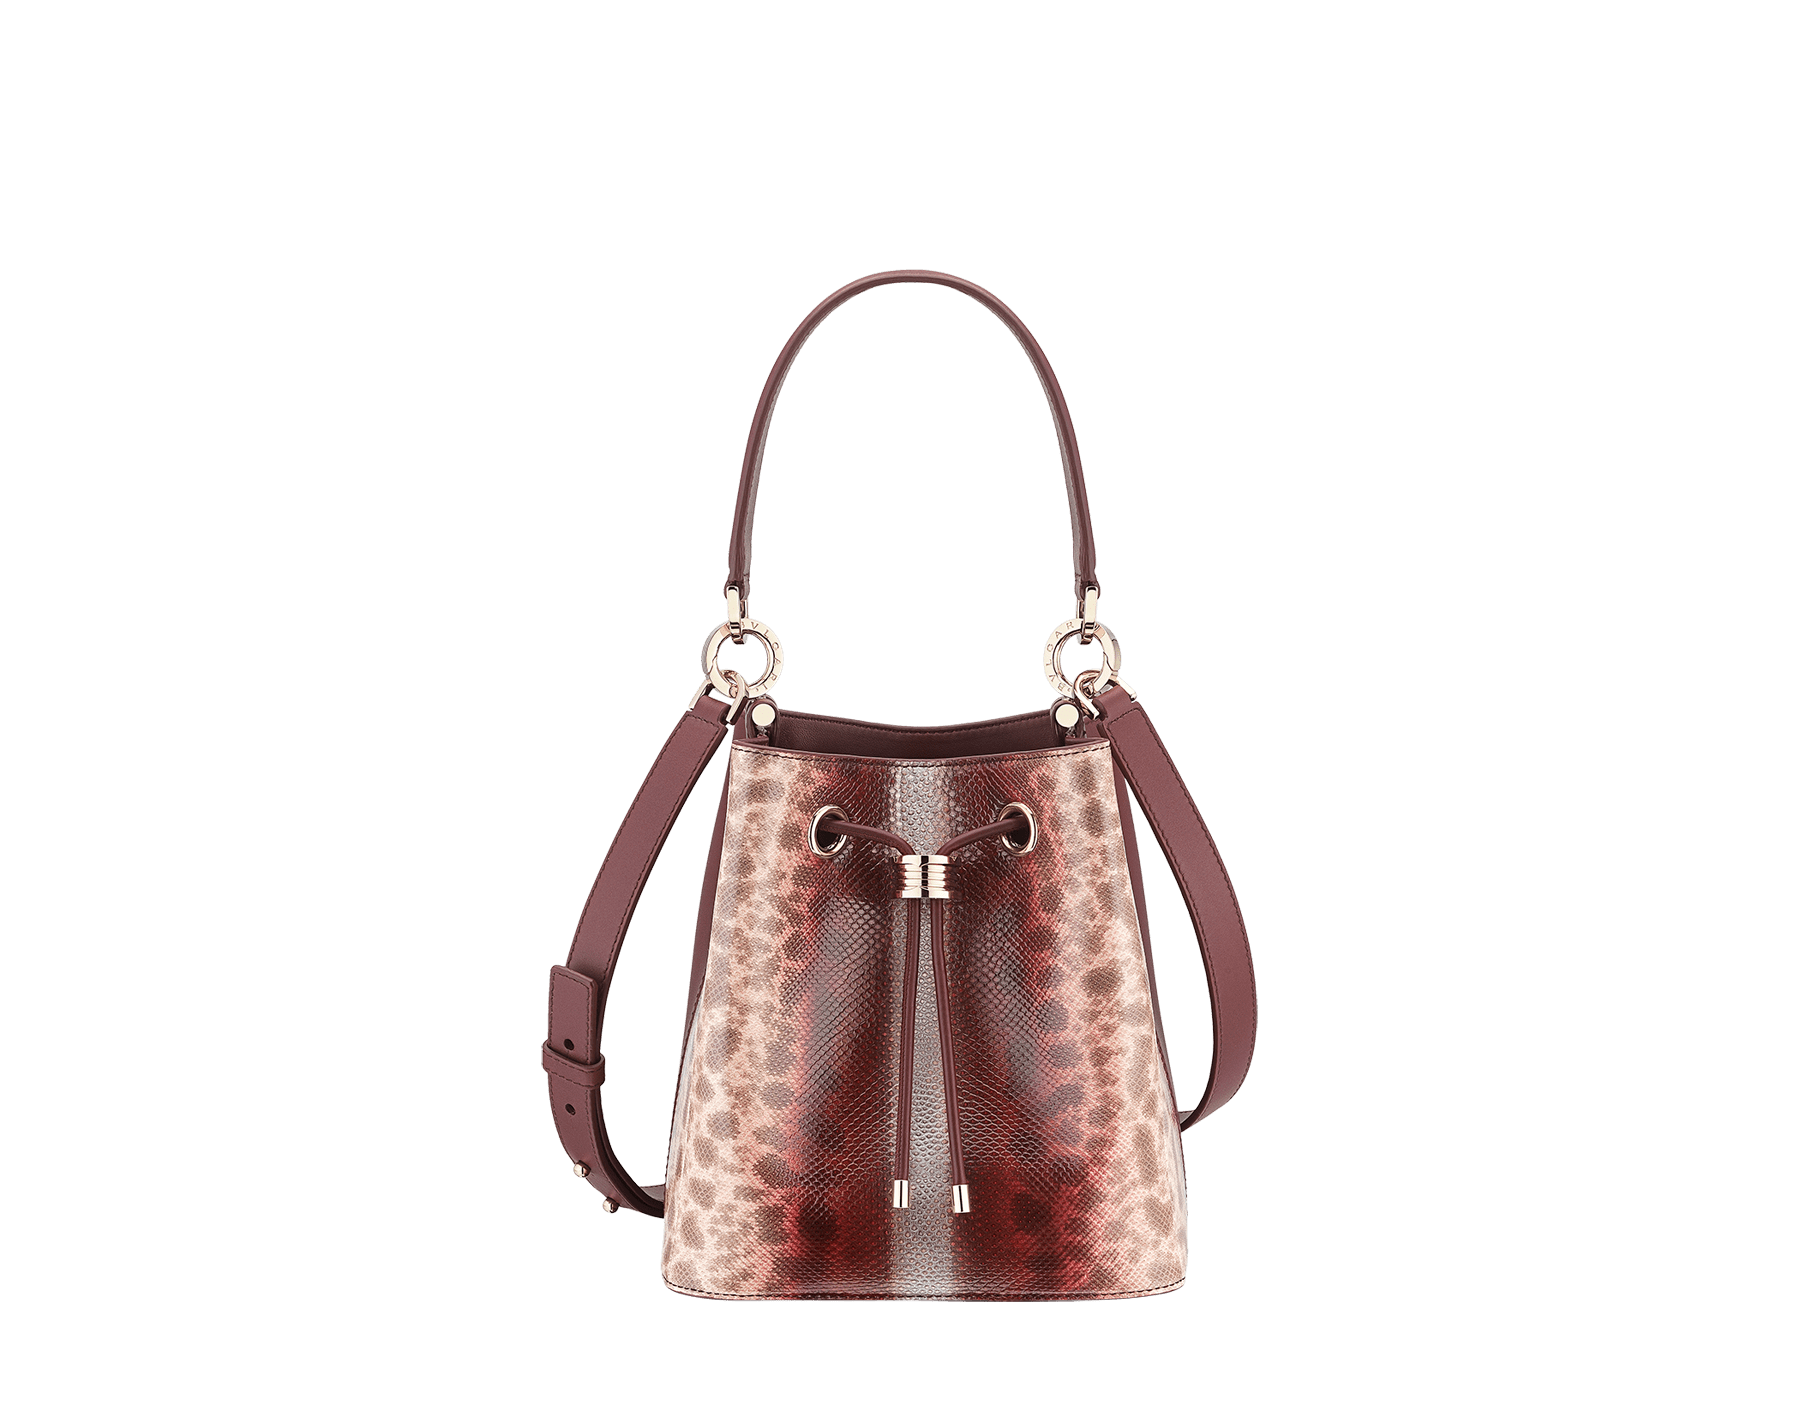 Bucket B.zero1 in rosa di francia Sahara karung skin and Roman garnet smooth calf leather with a Roman garnet nappa interior. Hardware in light gold plated brass, featuring B.zero1 décor. 289002 image 1